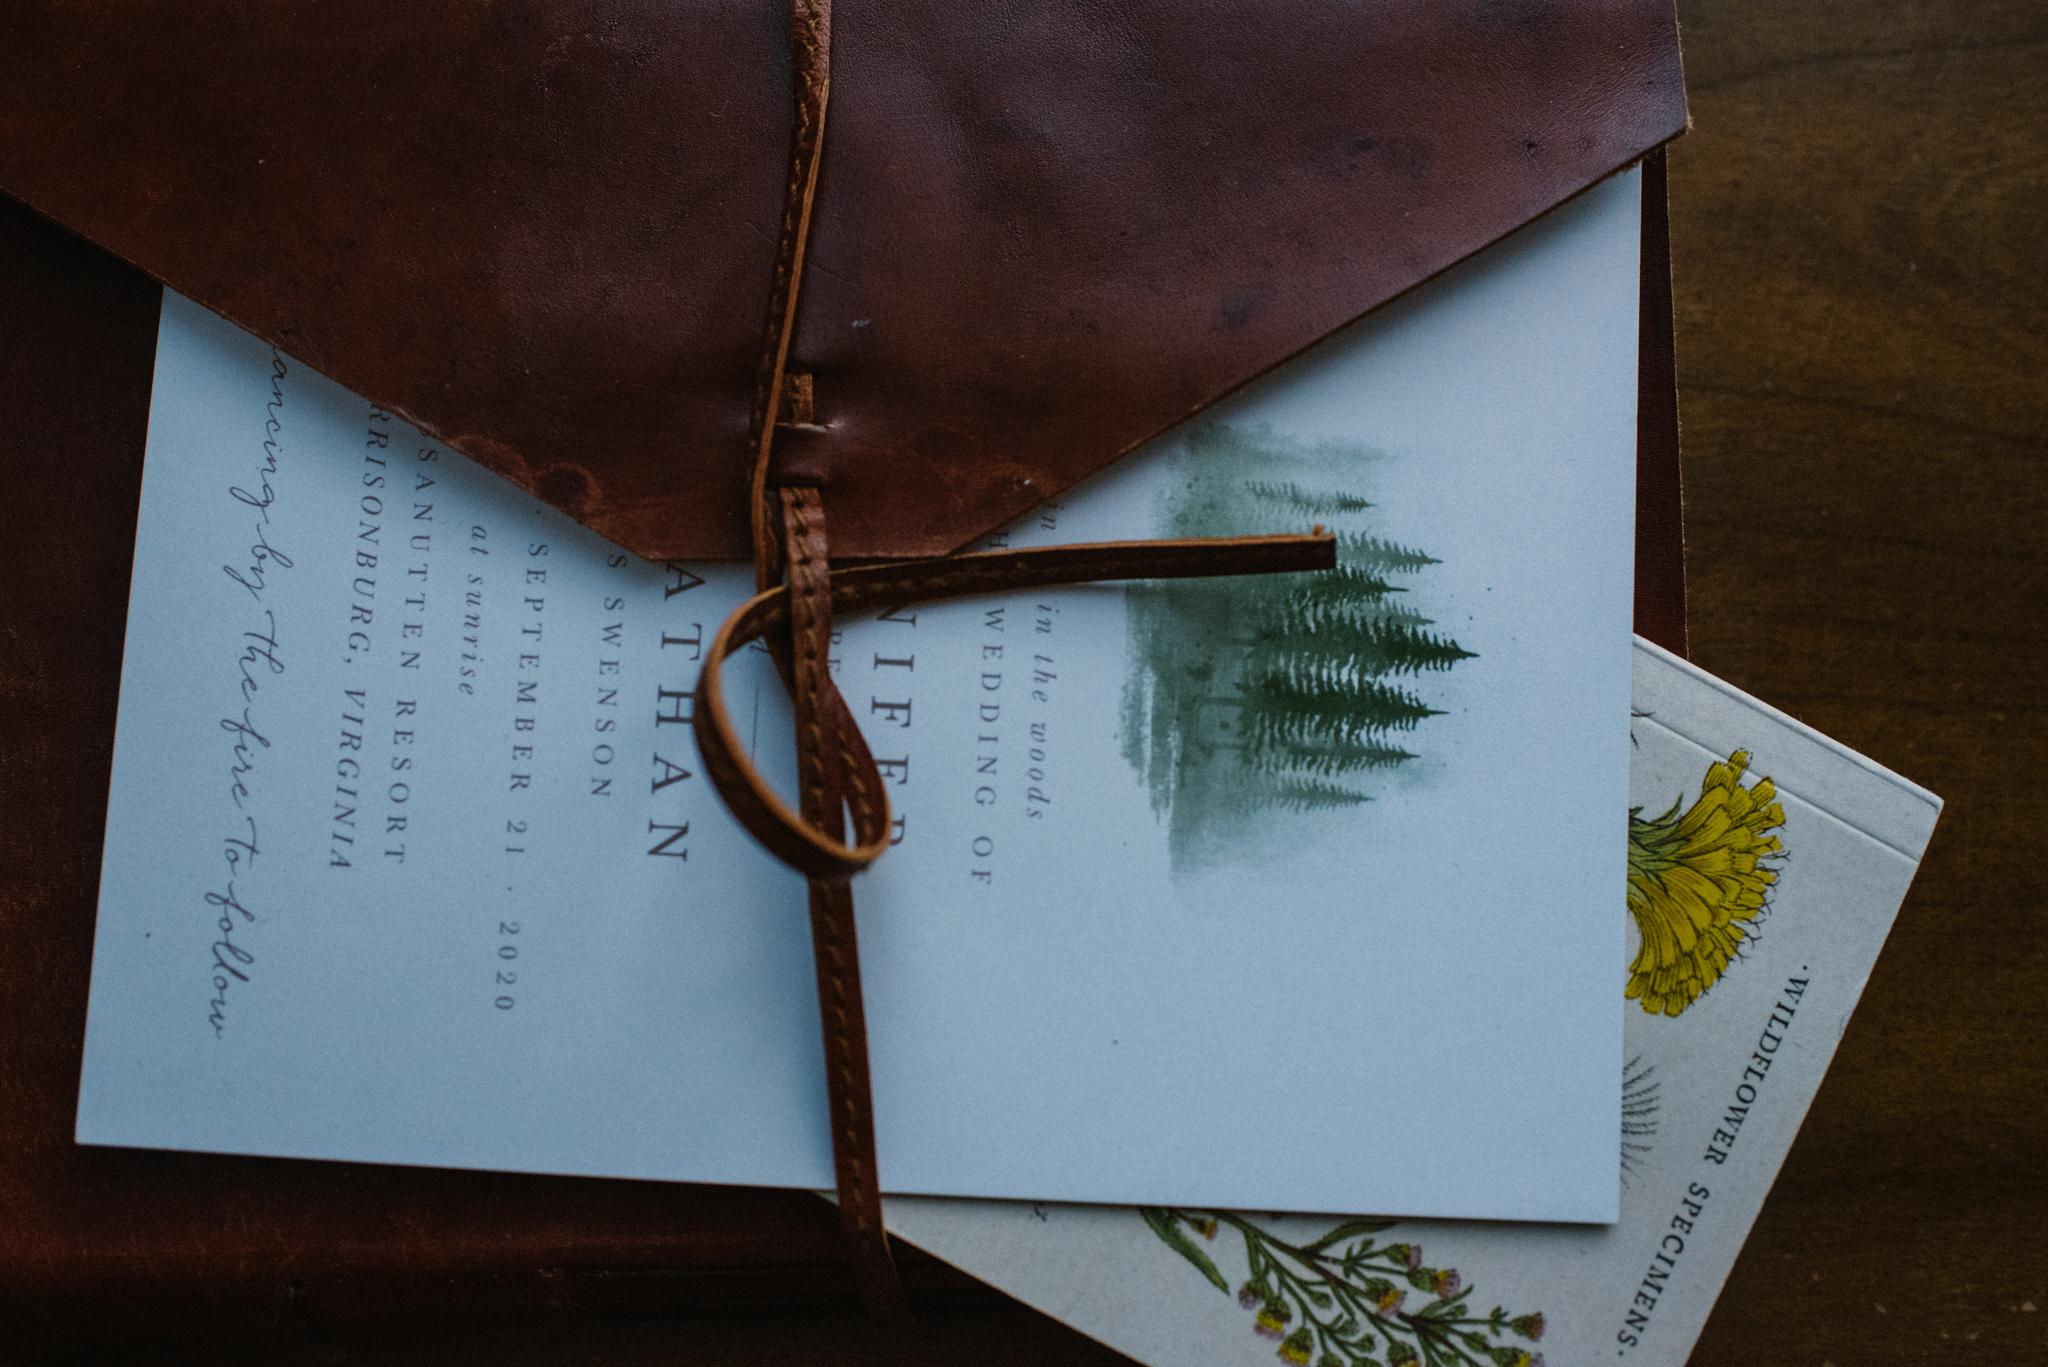 Basic Invite - Adventure Wedding Invitations - Mountain Wedding Invitations - White Sails Creative Wedding Photography - Elopement Photography - Virginia Wedding Photographer - Blue Ridge Mountain Wedding Invitations_4.jpg